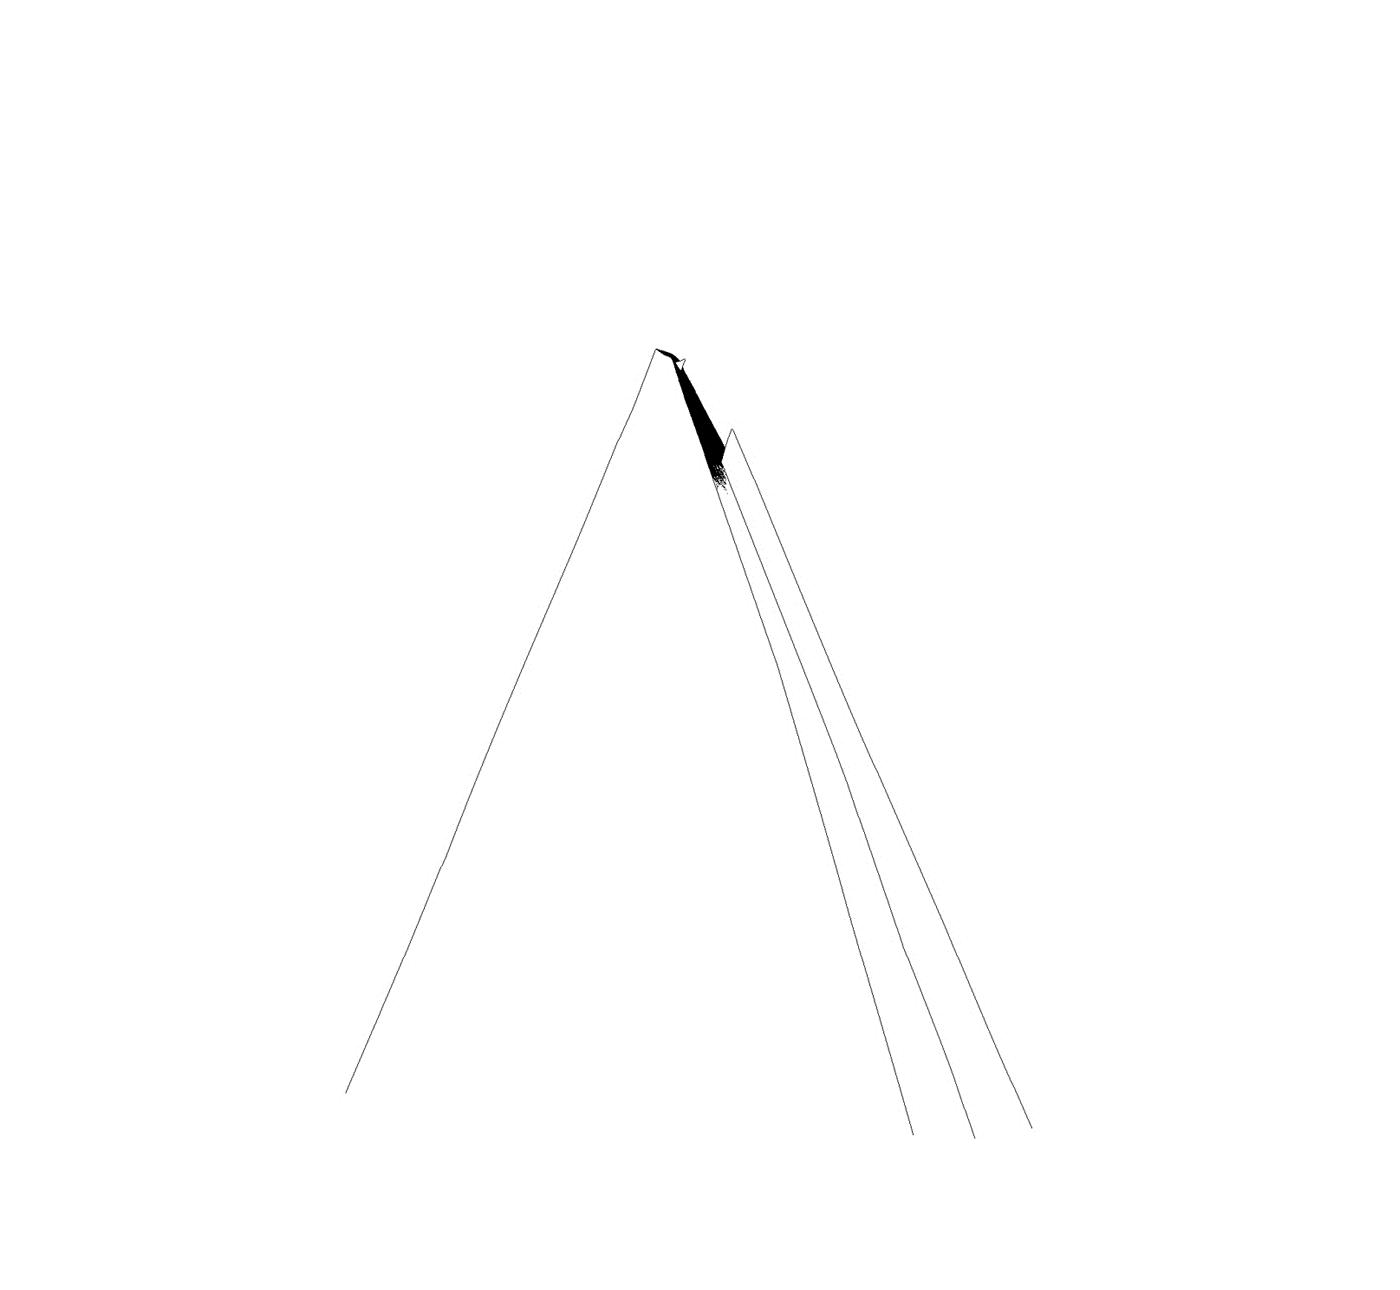 Digital Art  Drawing  landscape drawing ms paint Pixel art